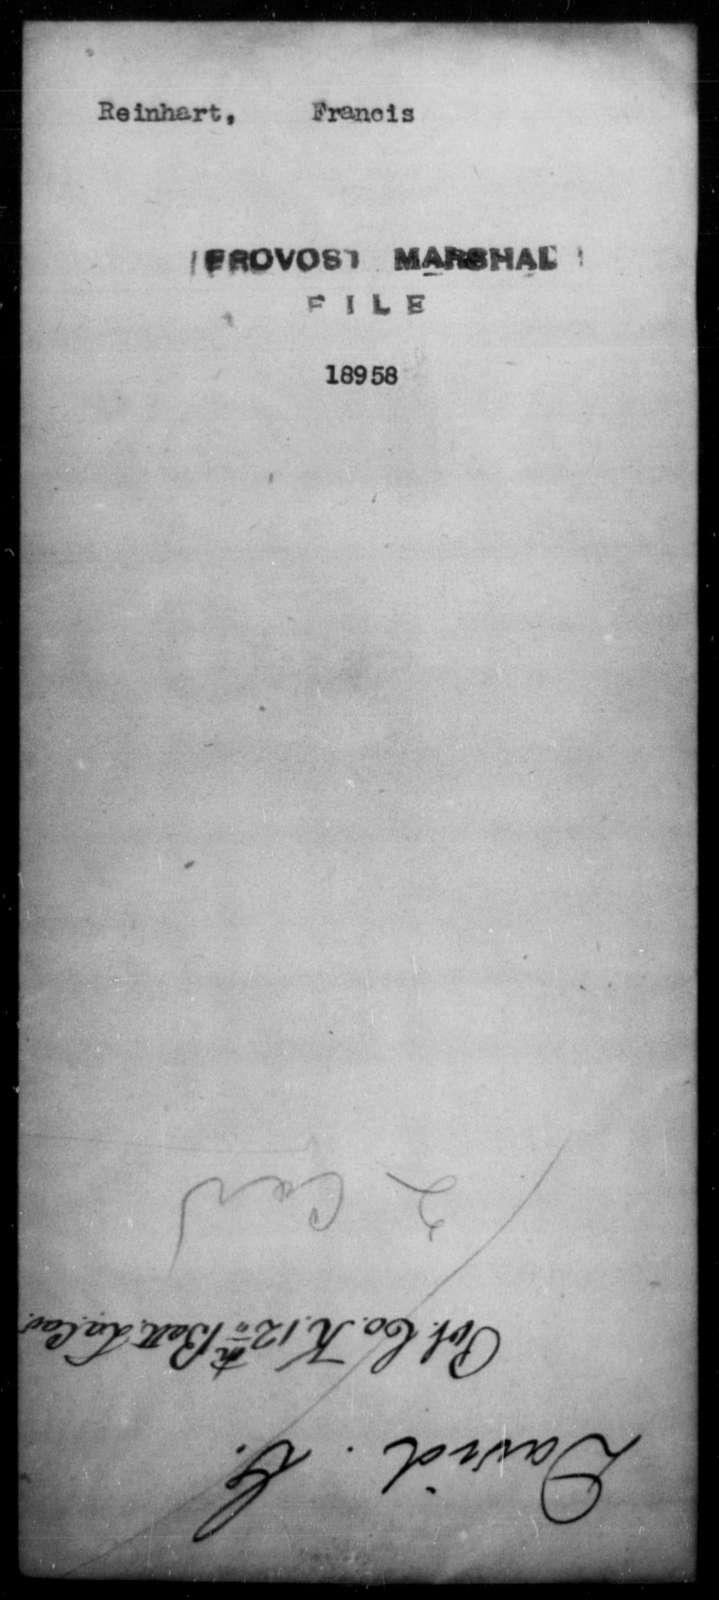 Reinhart, Francis - State: [Blank] - Year: [Blank]